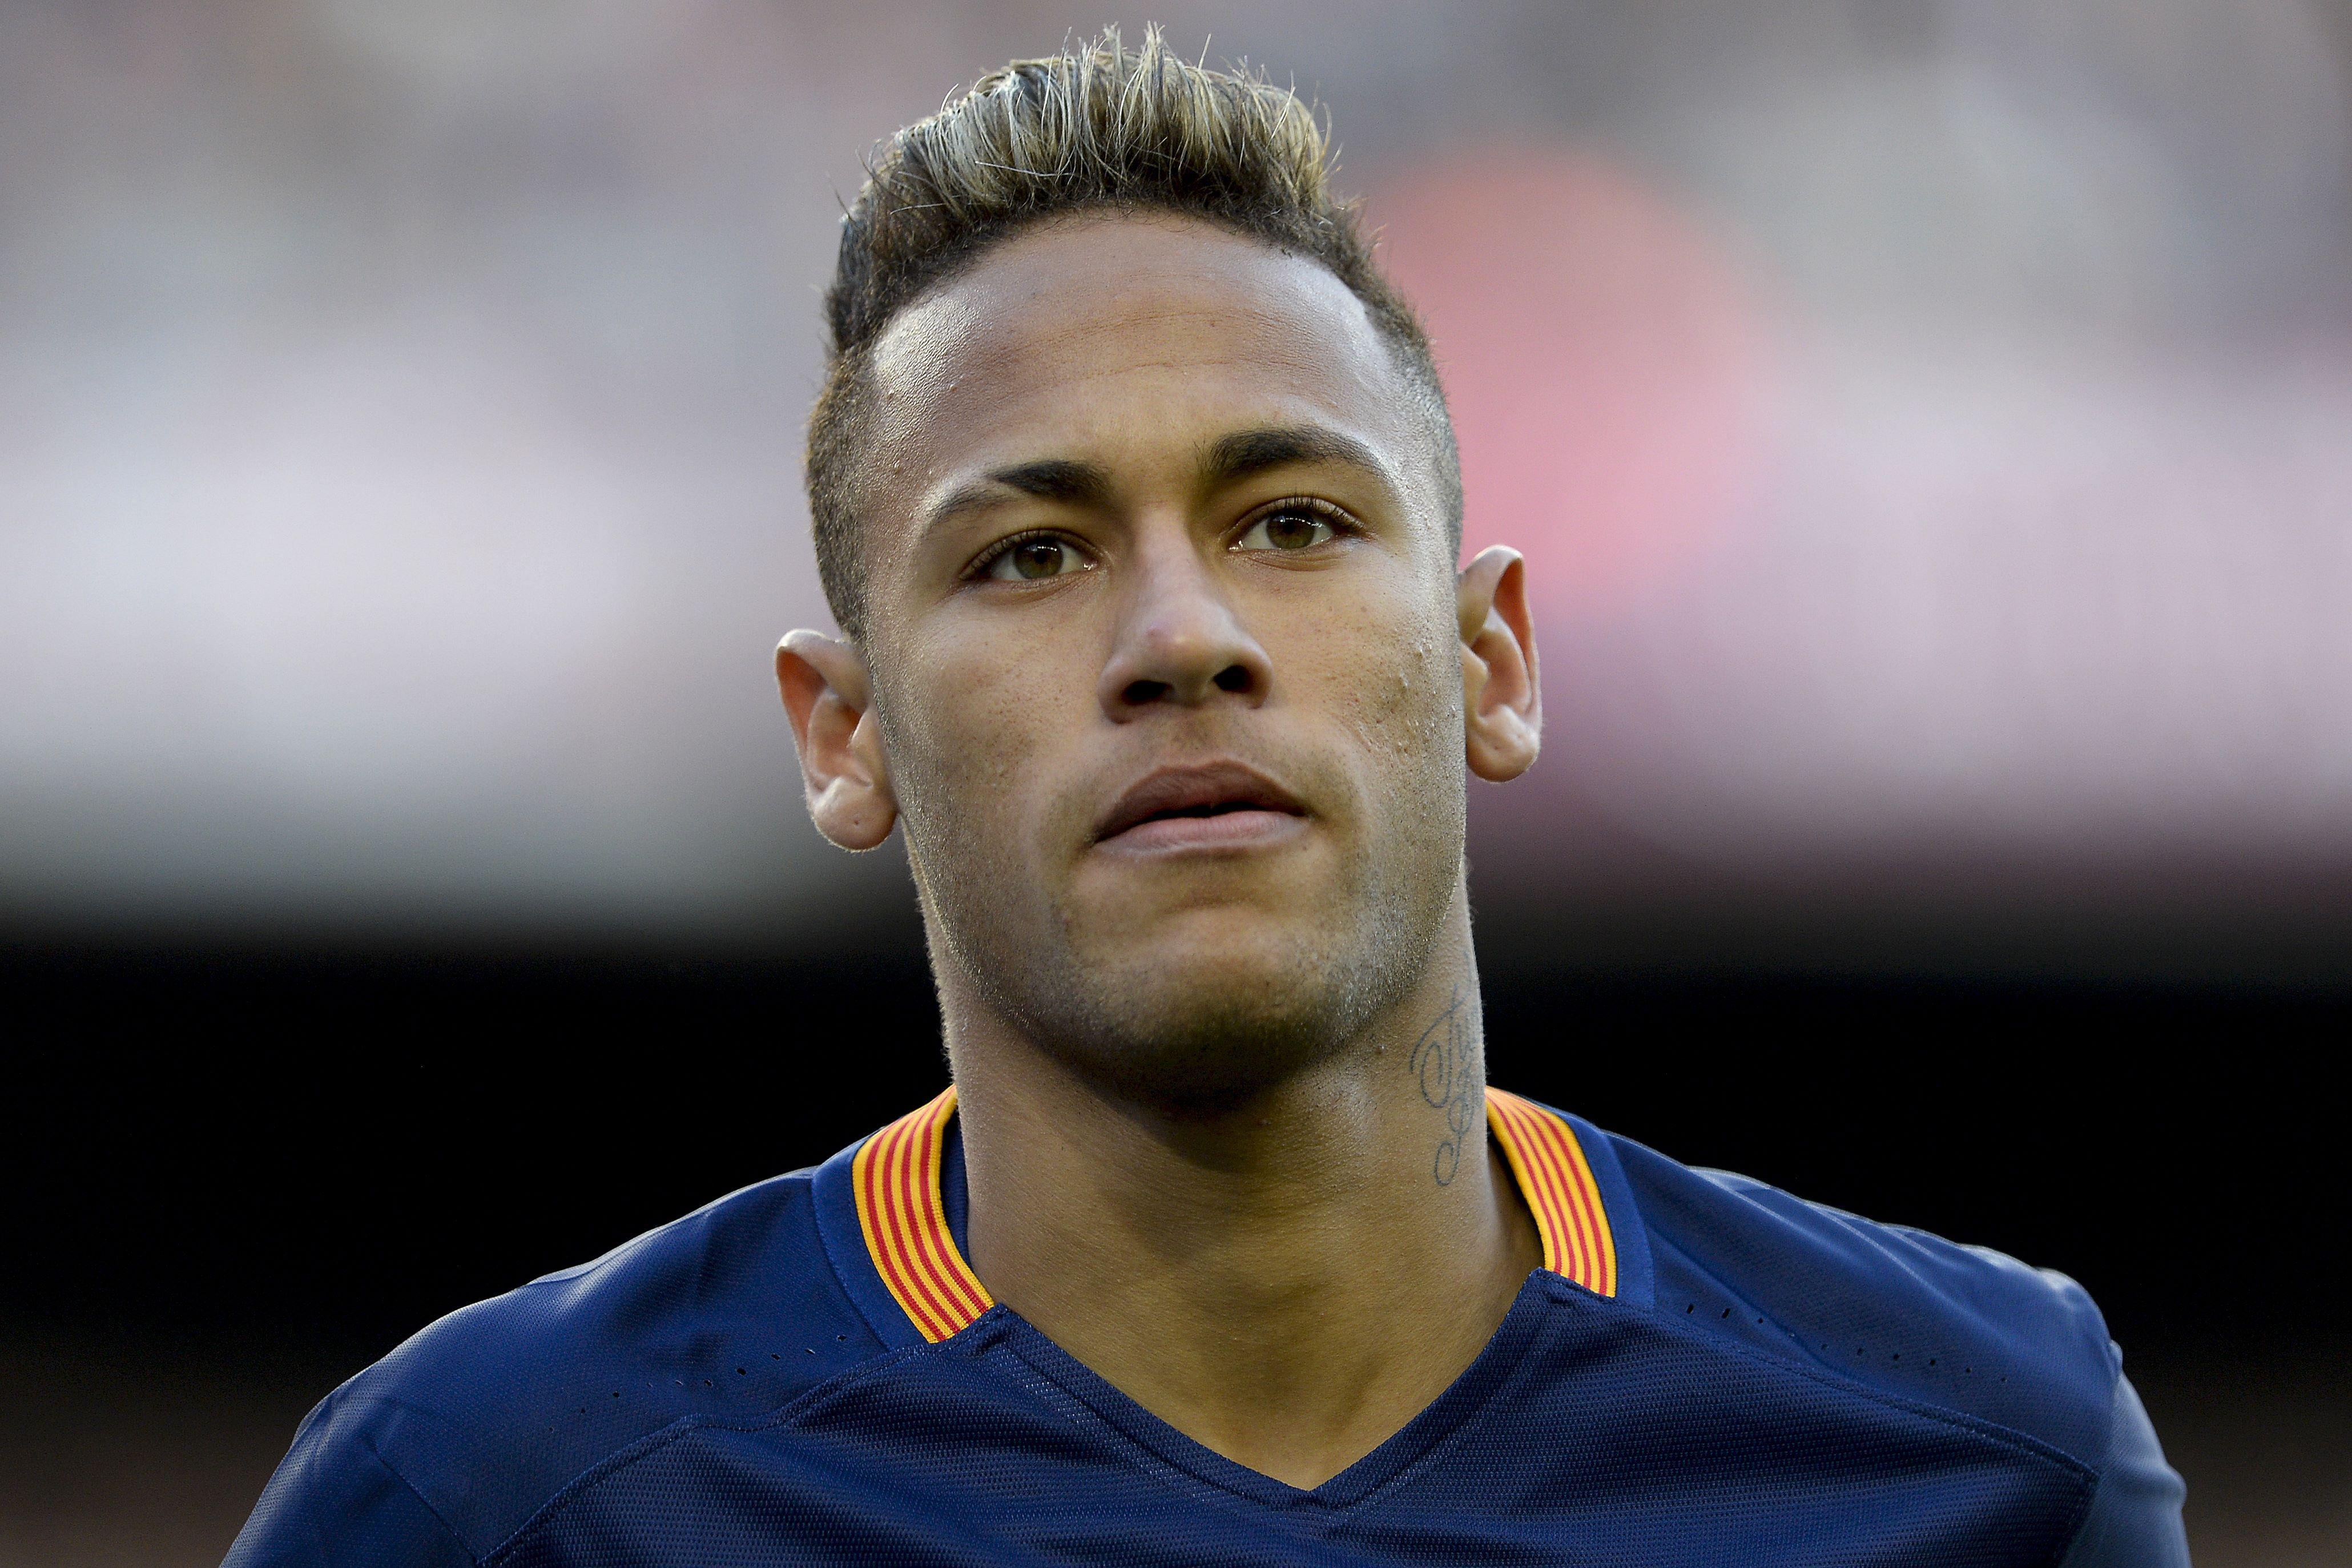 Neymar wallpapers images photos pictures backgrounds for Neymar coupe de cheveux tuto